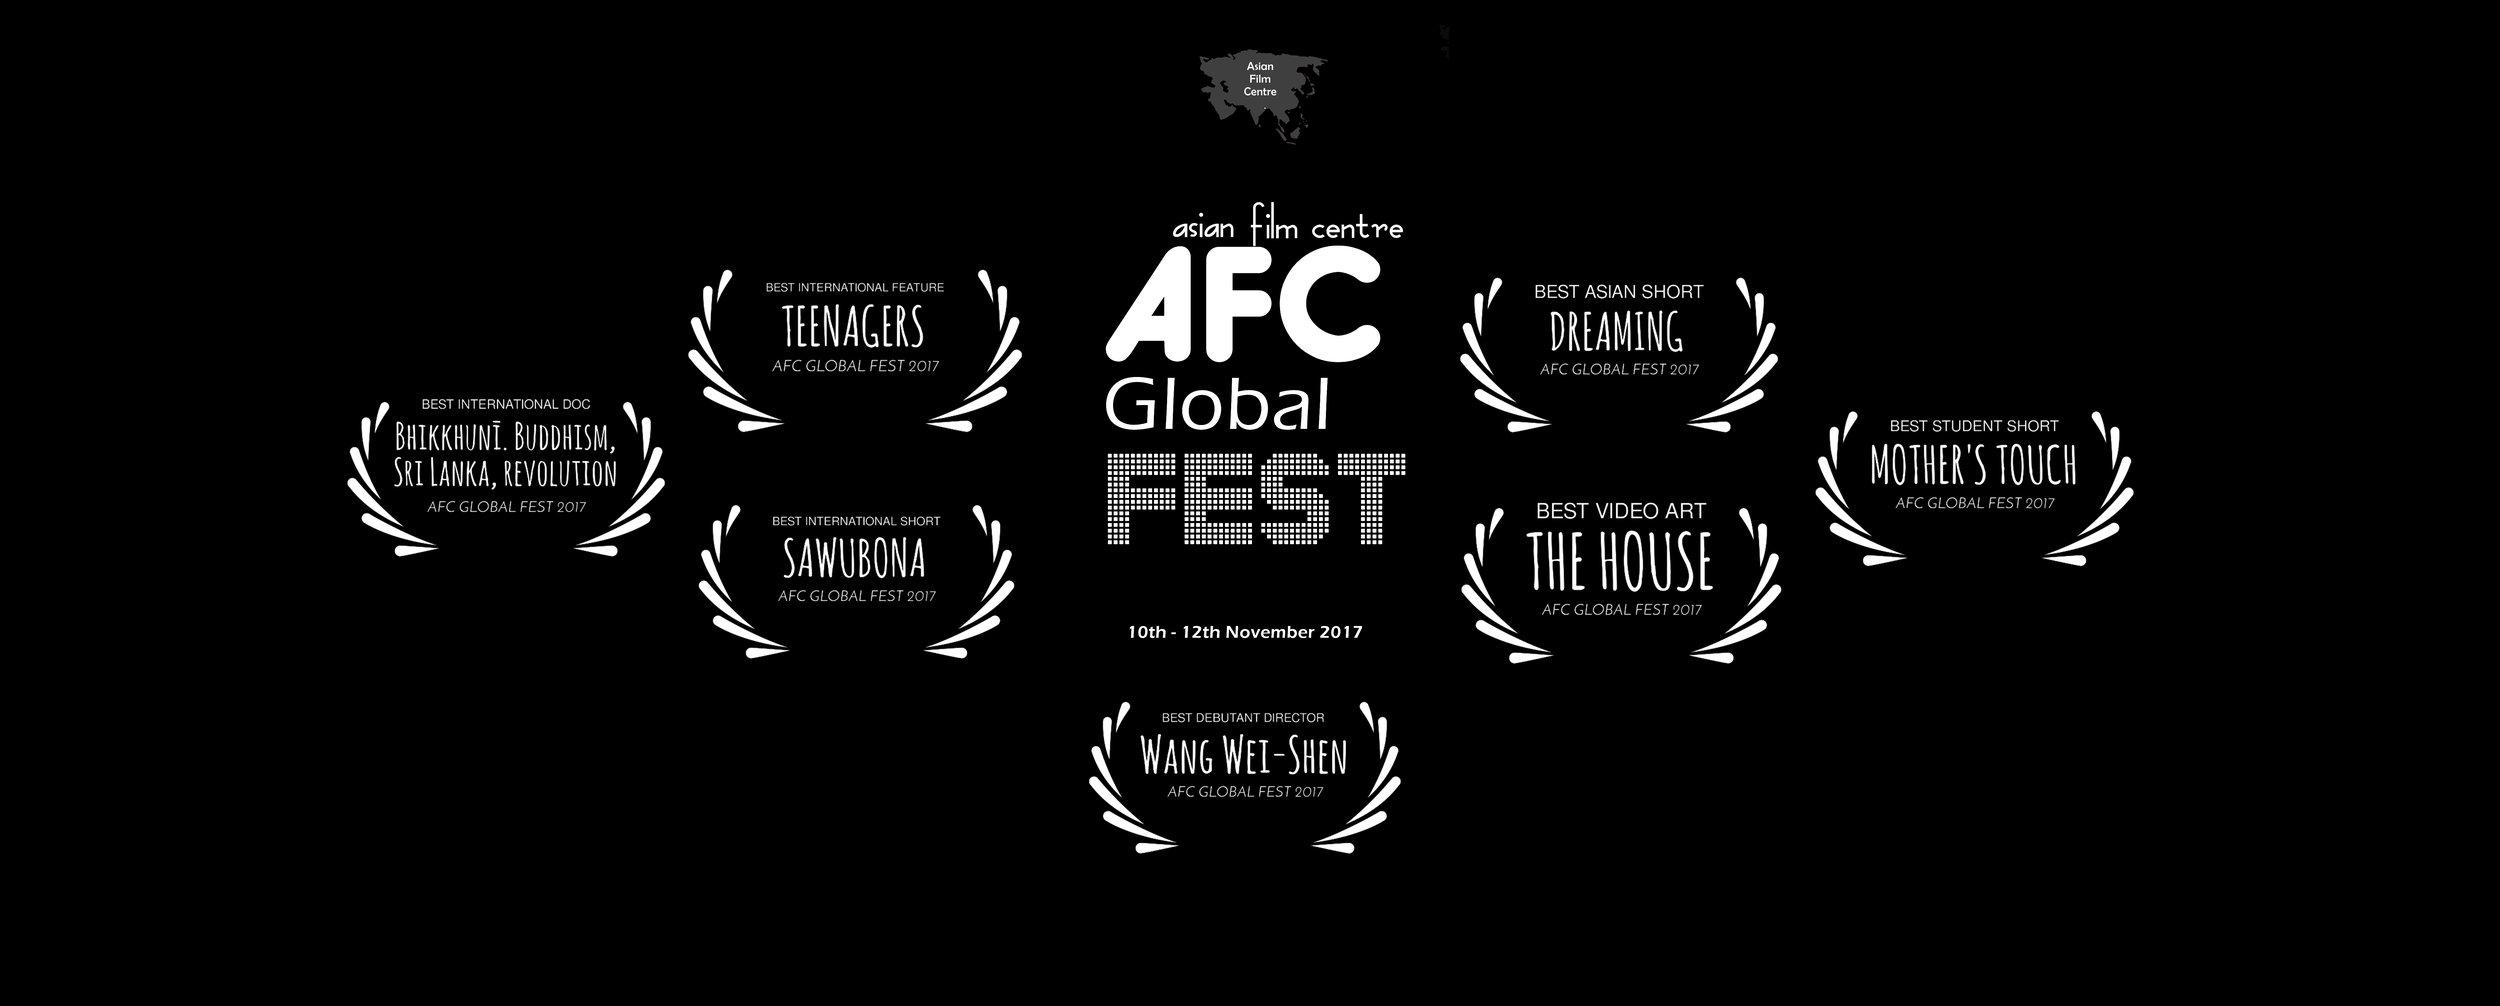 AFC-Global-Fest-Winners.jpg